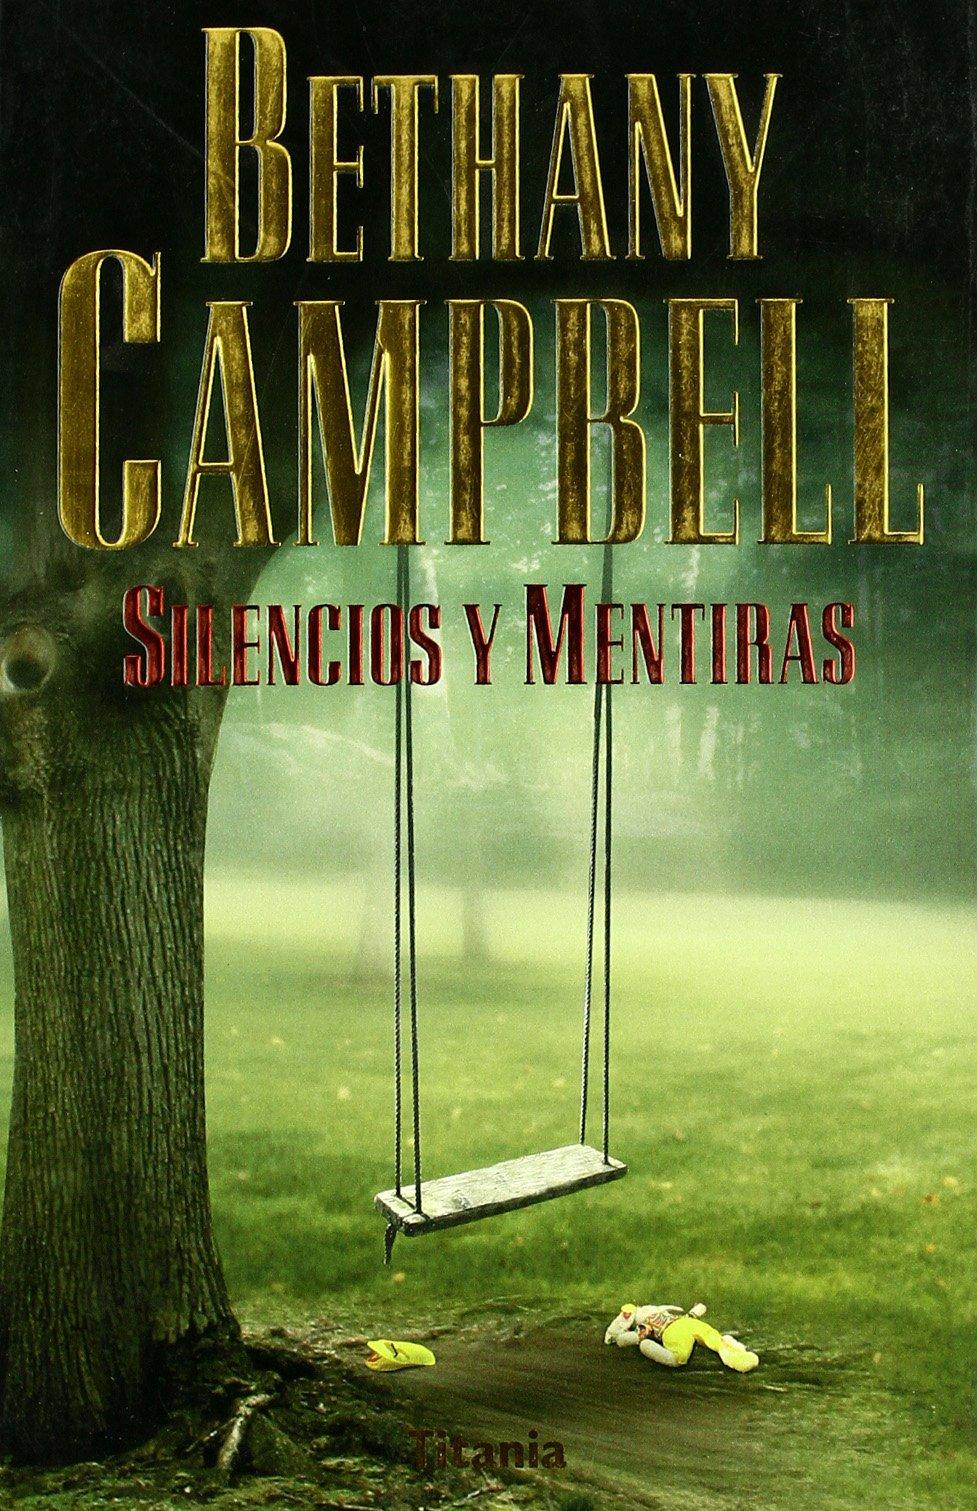 Silencios y Mentiras (Spanish Edition) (Spanish) Paperback – November 1, 2003